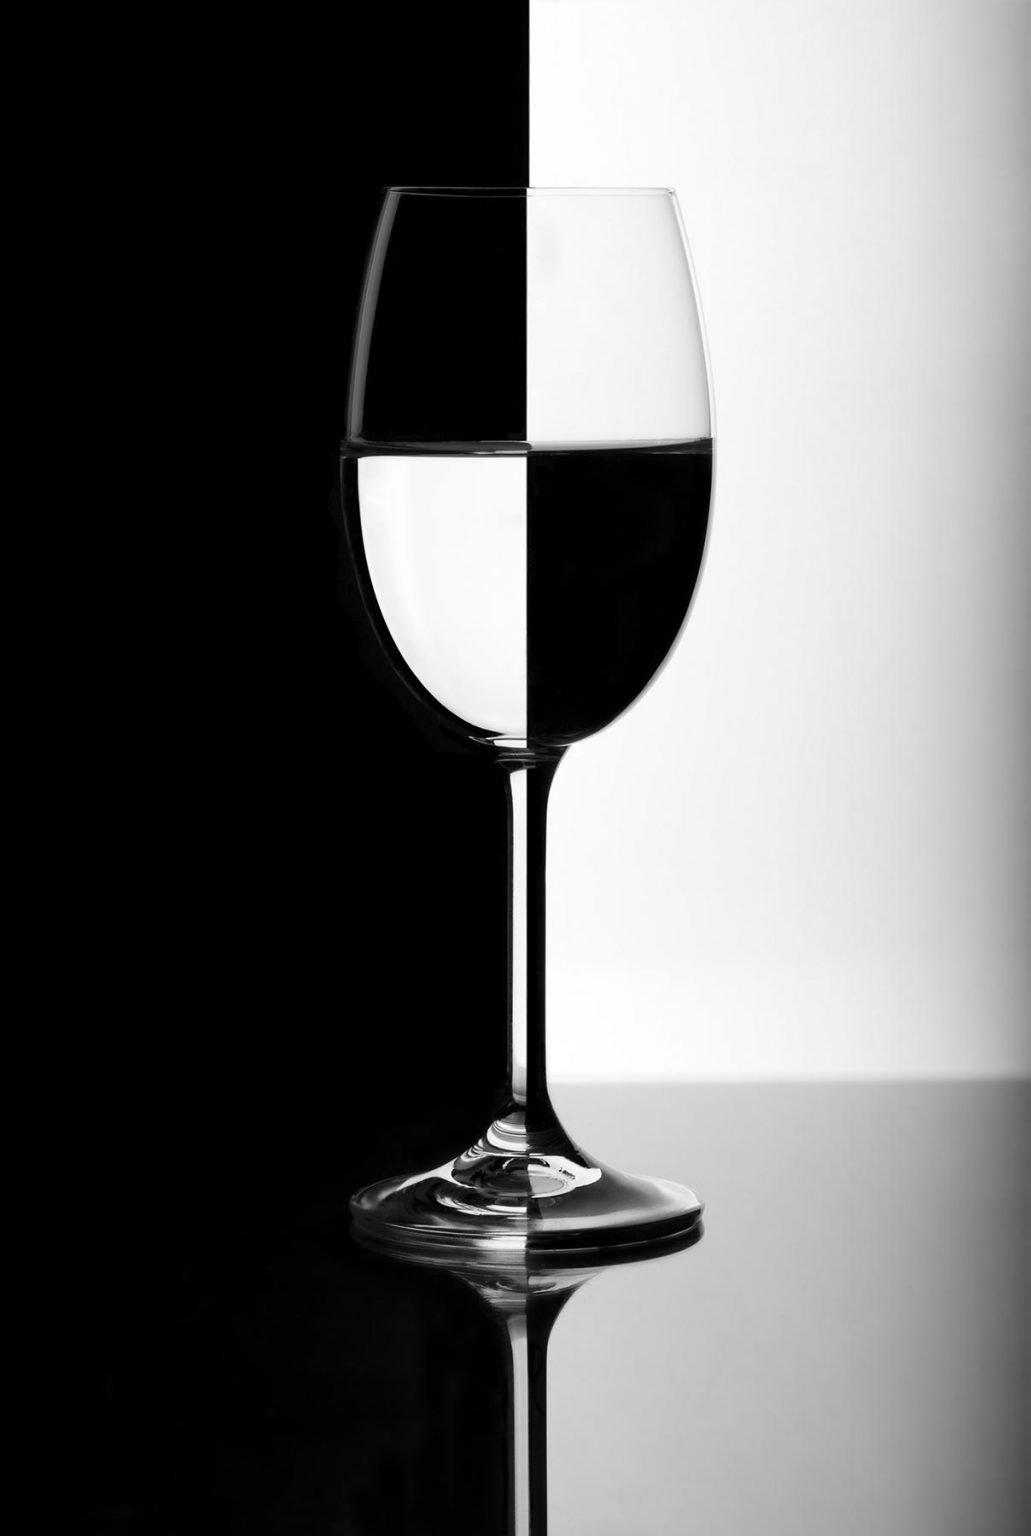 black-and-white-wine-glass-PLZ4486-1.jpg